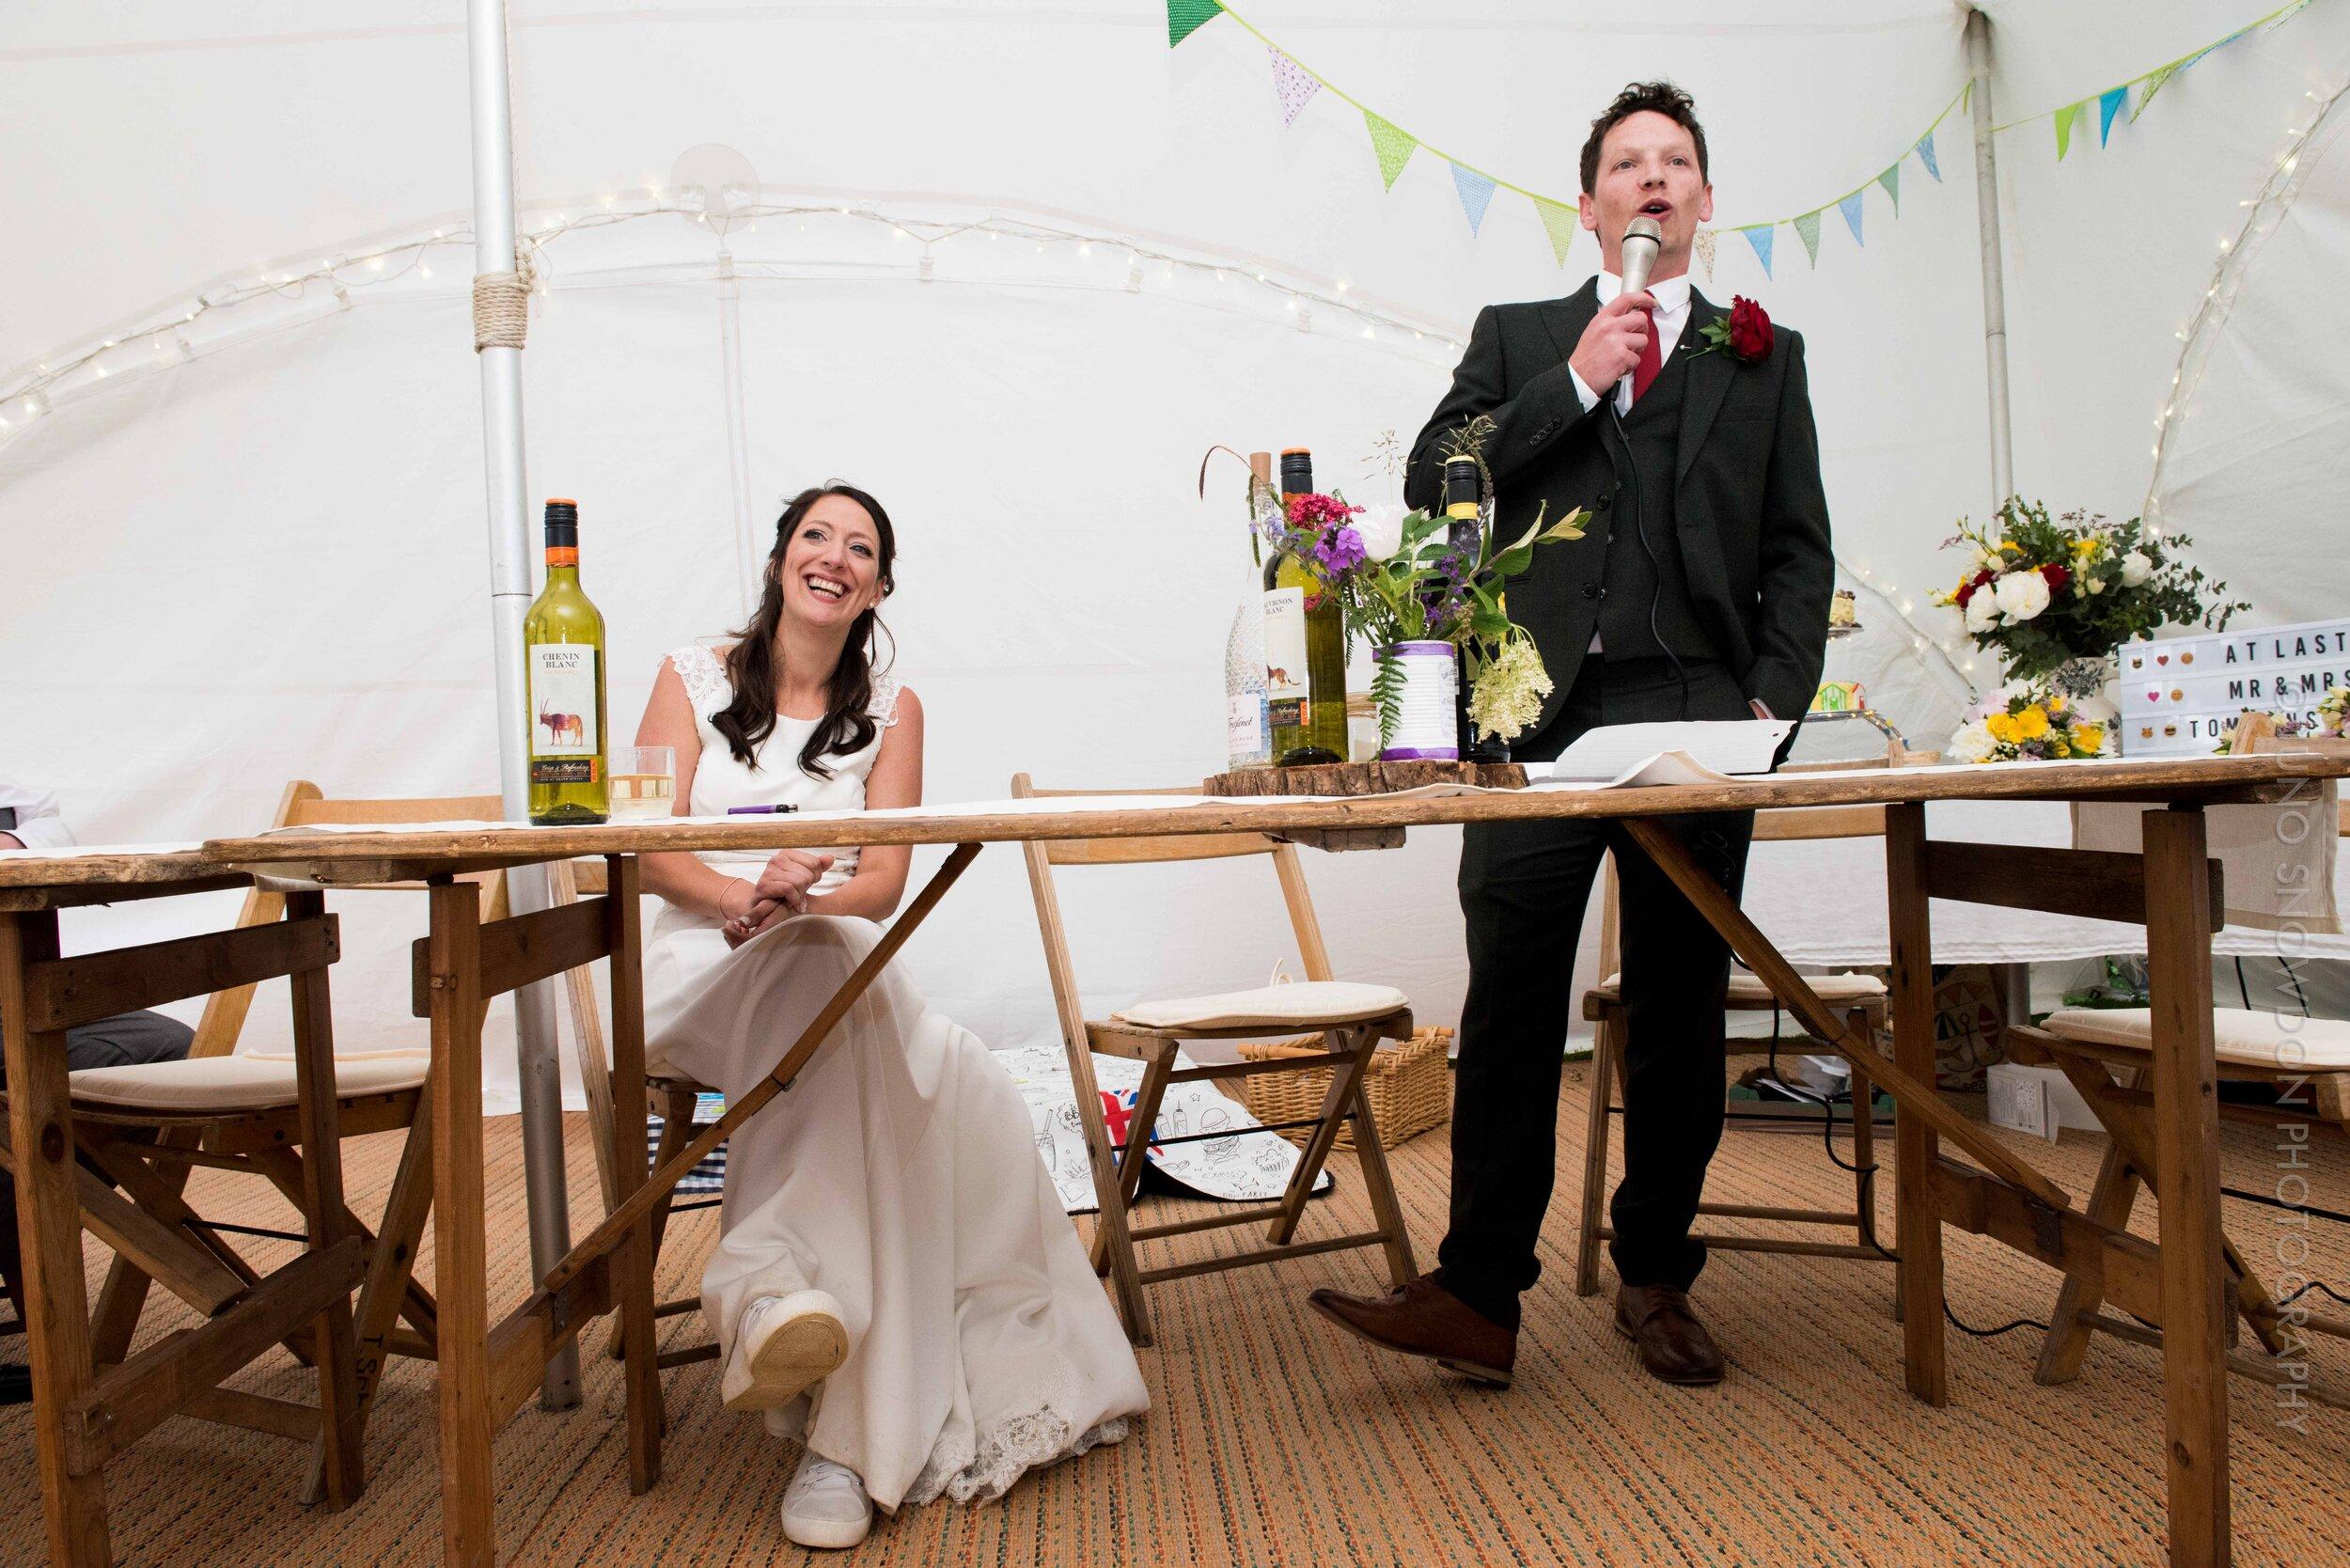 juno-snowdon-photography-wedding-8369.jpg